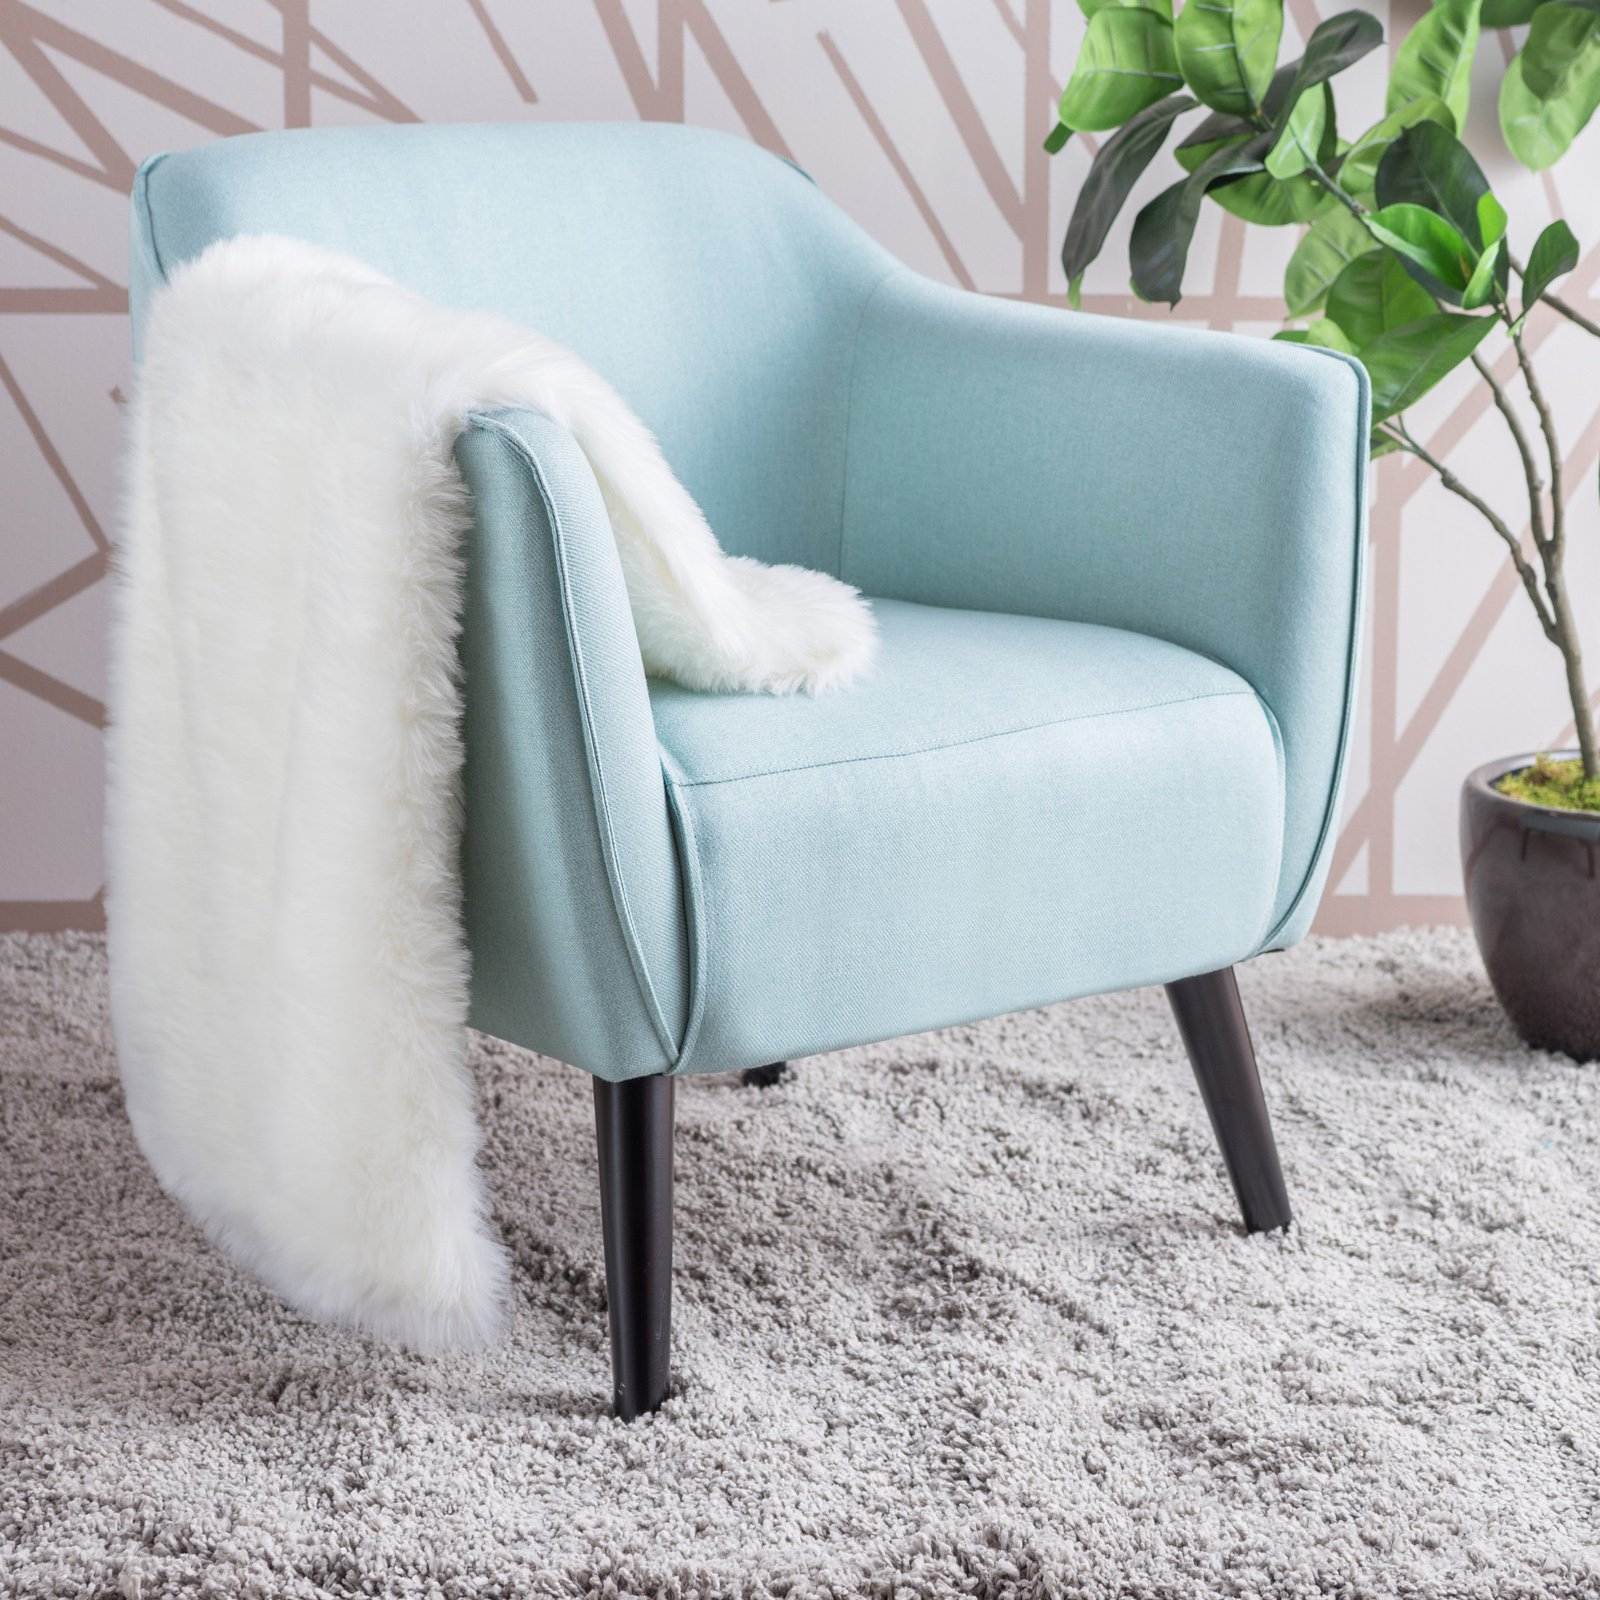 Peachy Cedric Fabric Arm Chair Dark Teal In 2019 Interior Design Unemploymentrelief Wooden Chair Designs For Living Room Unemploymentrelieforg